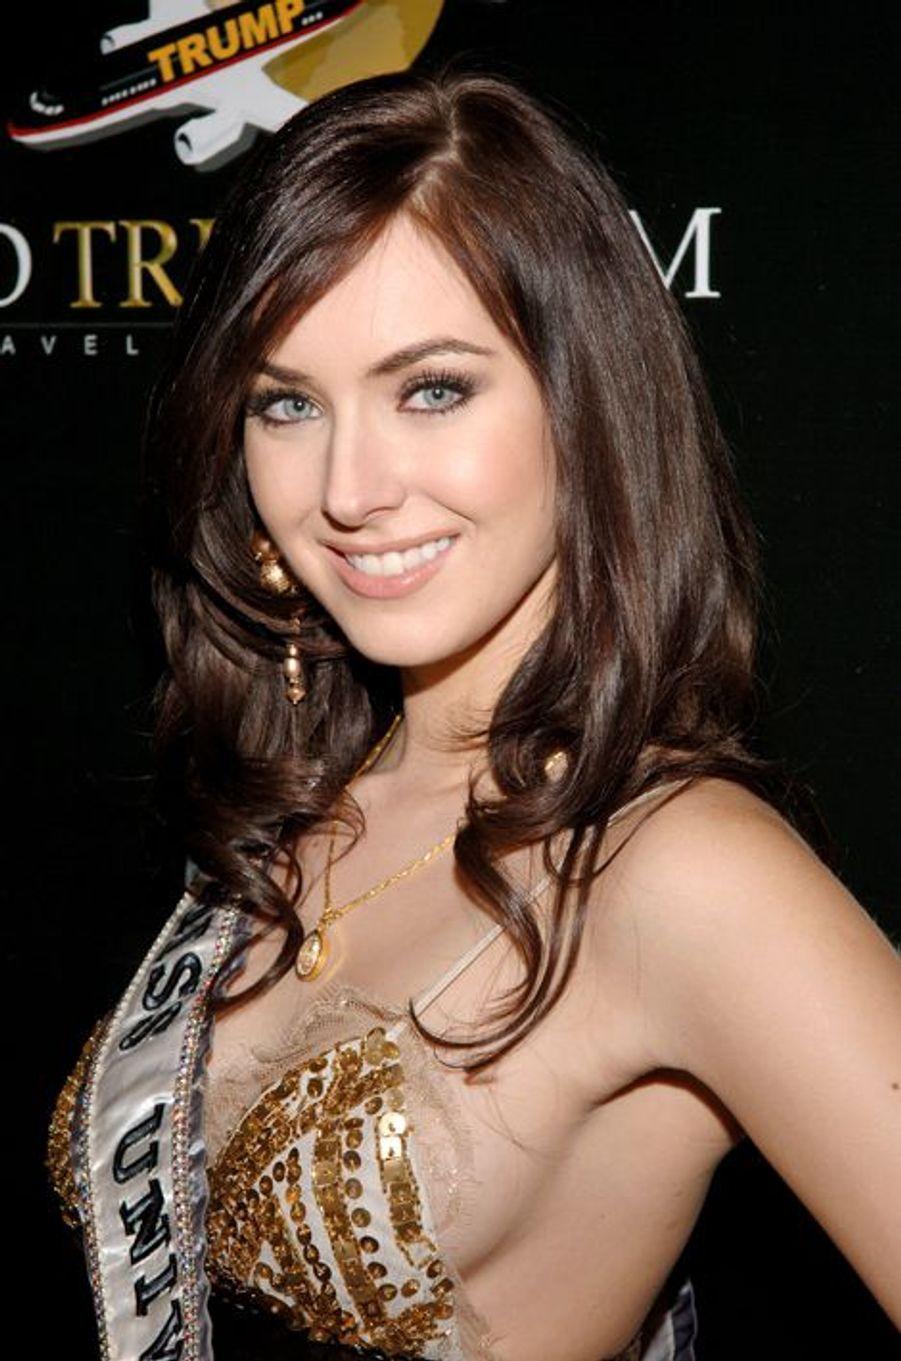 Natalie Glebova, Miss Canada élue Miss Univers 2005